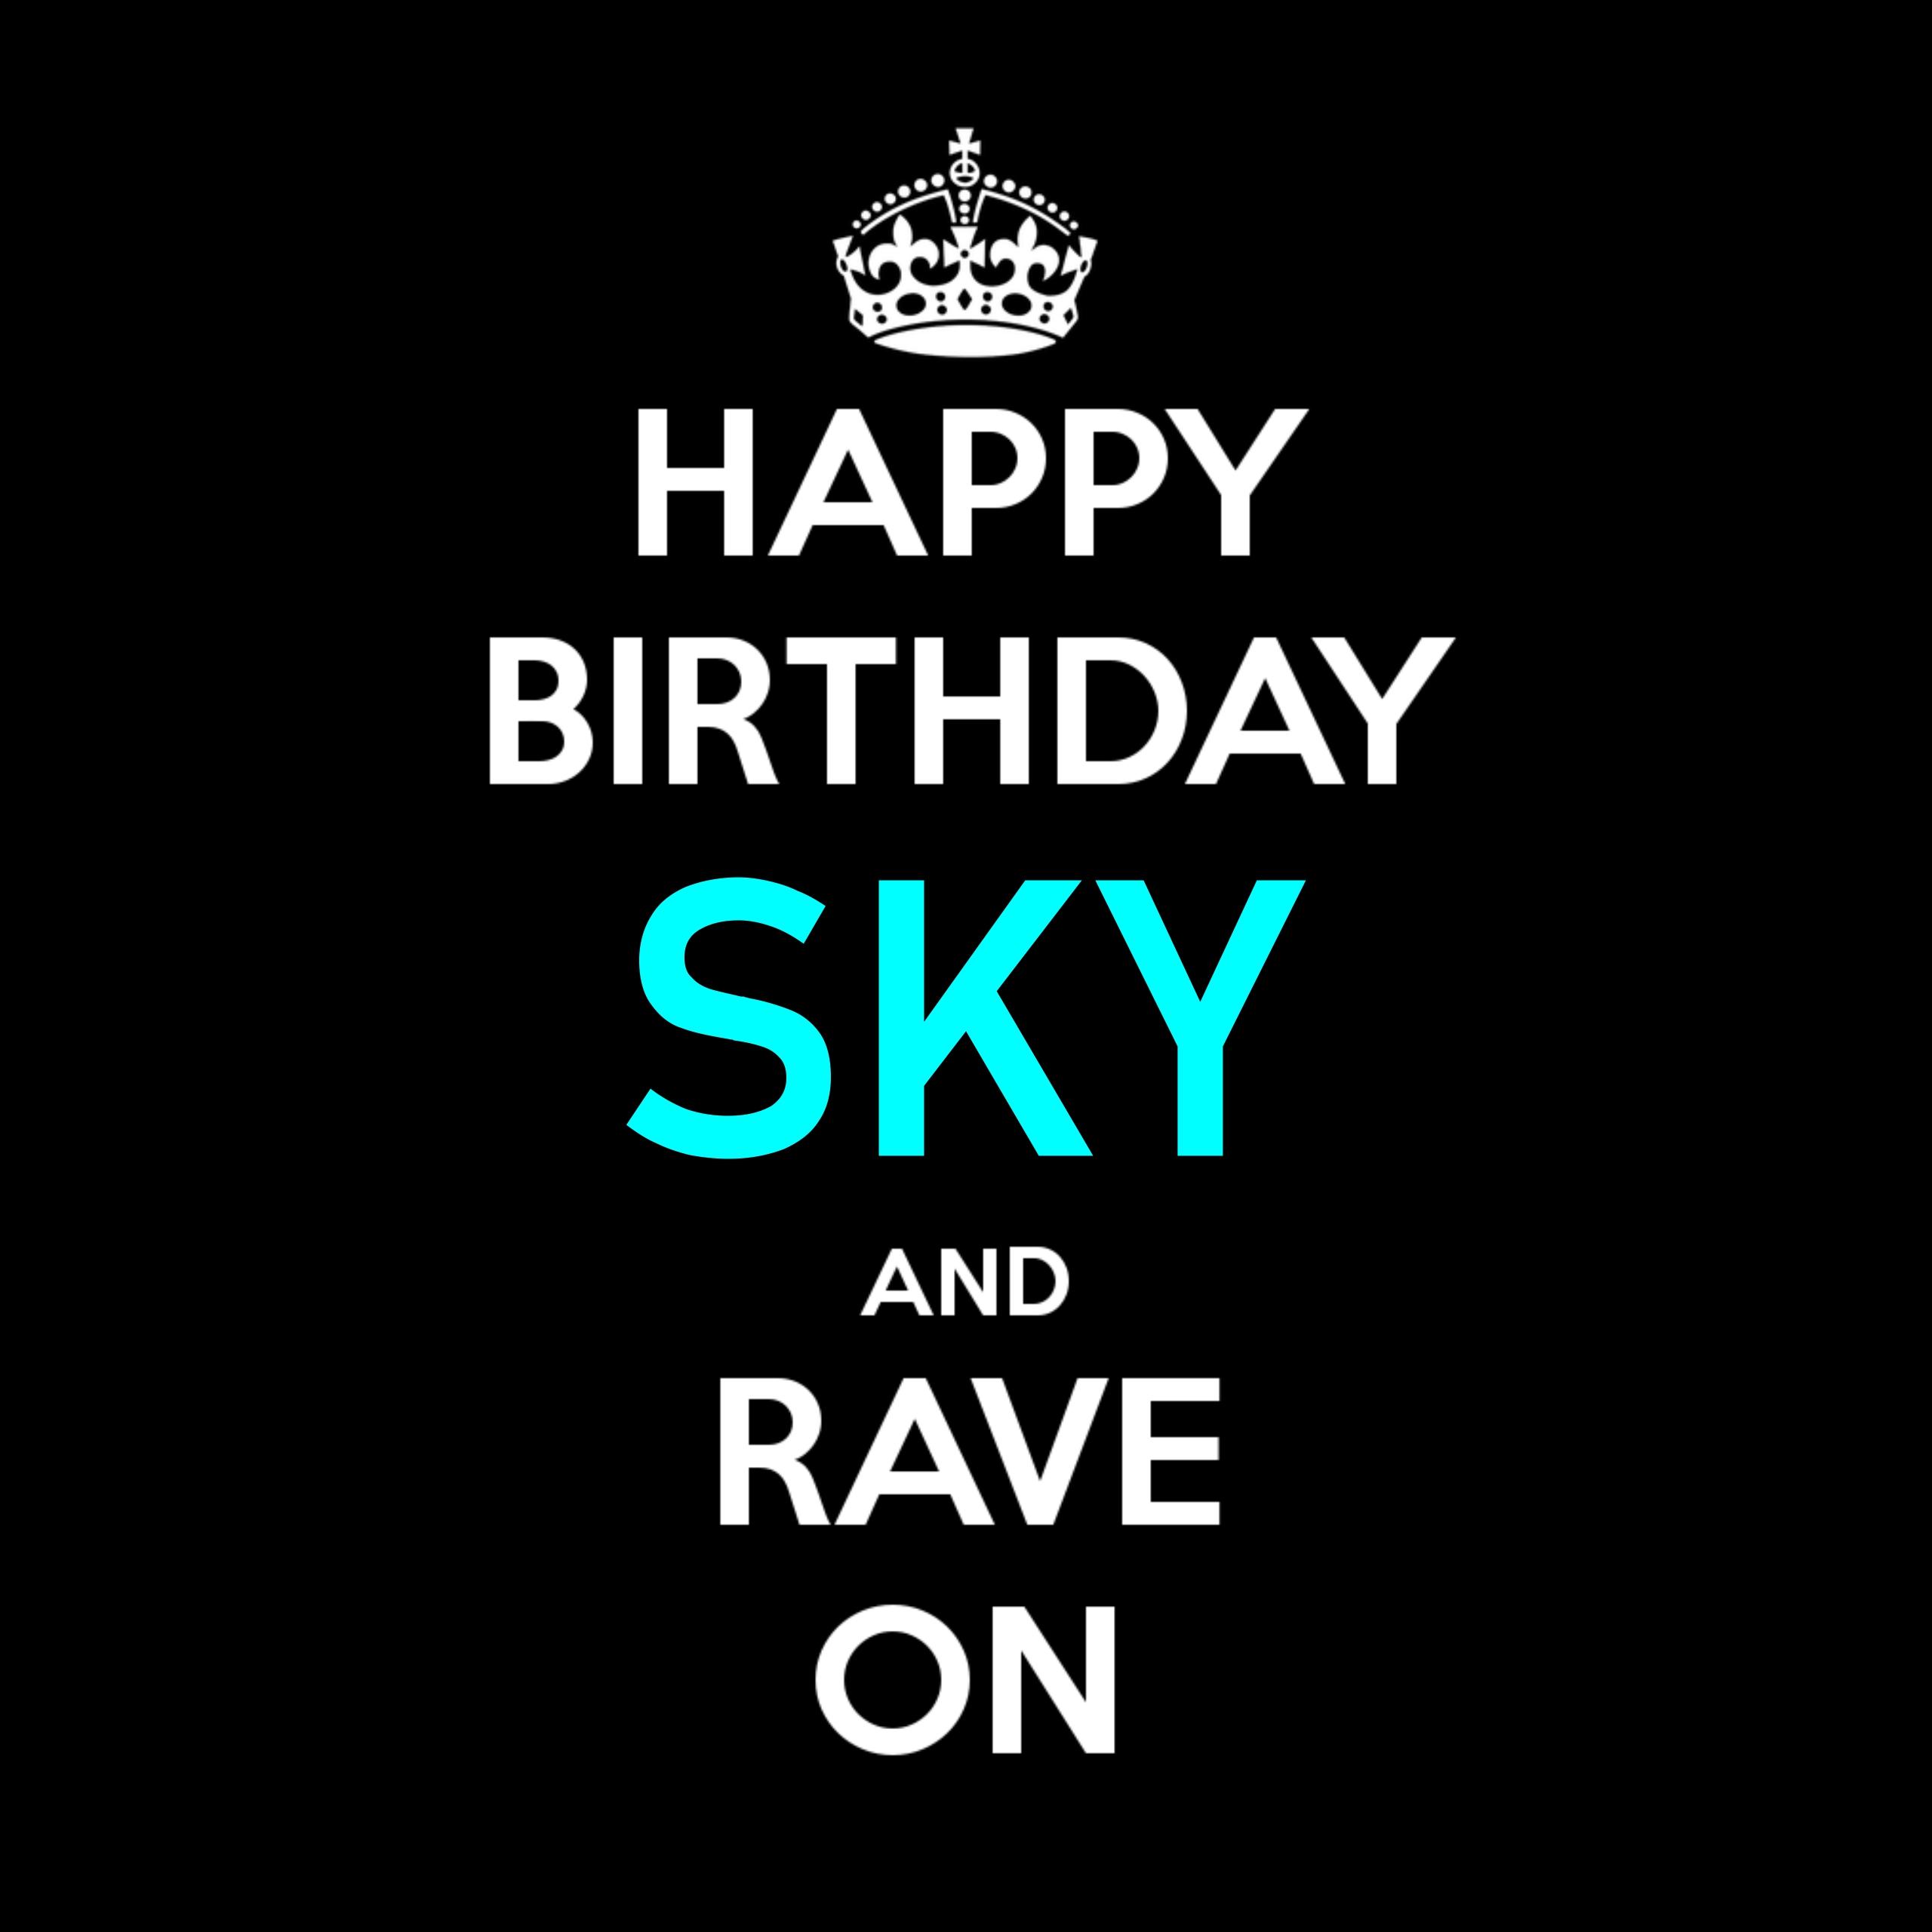 Sky's Birthday